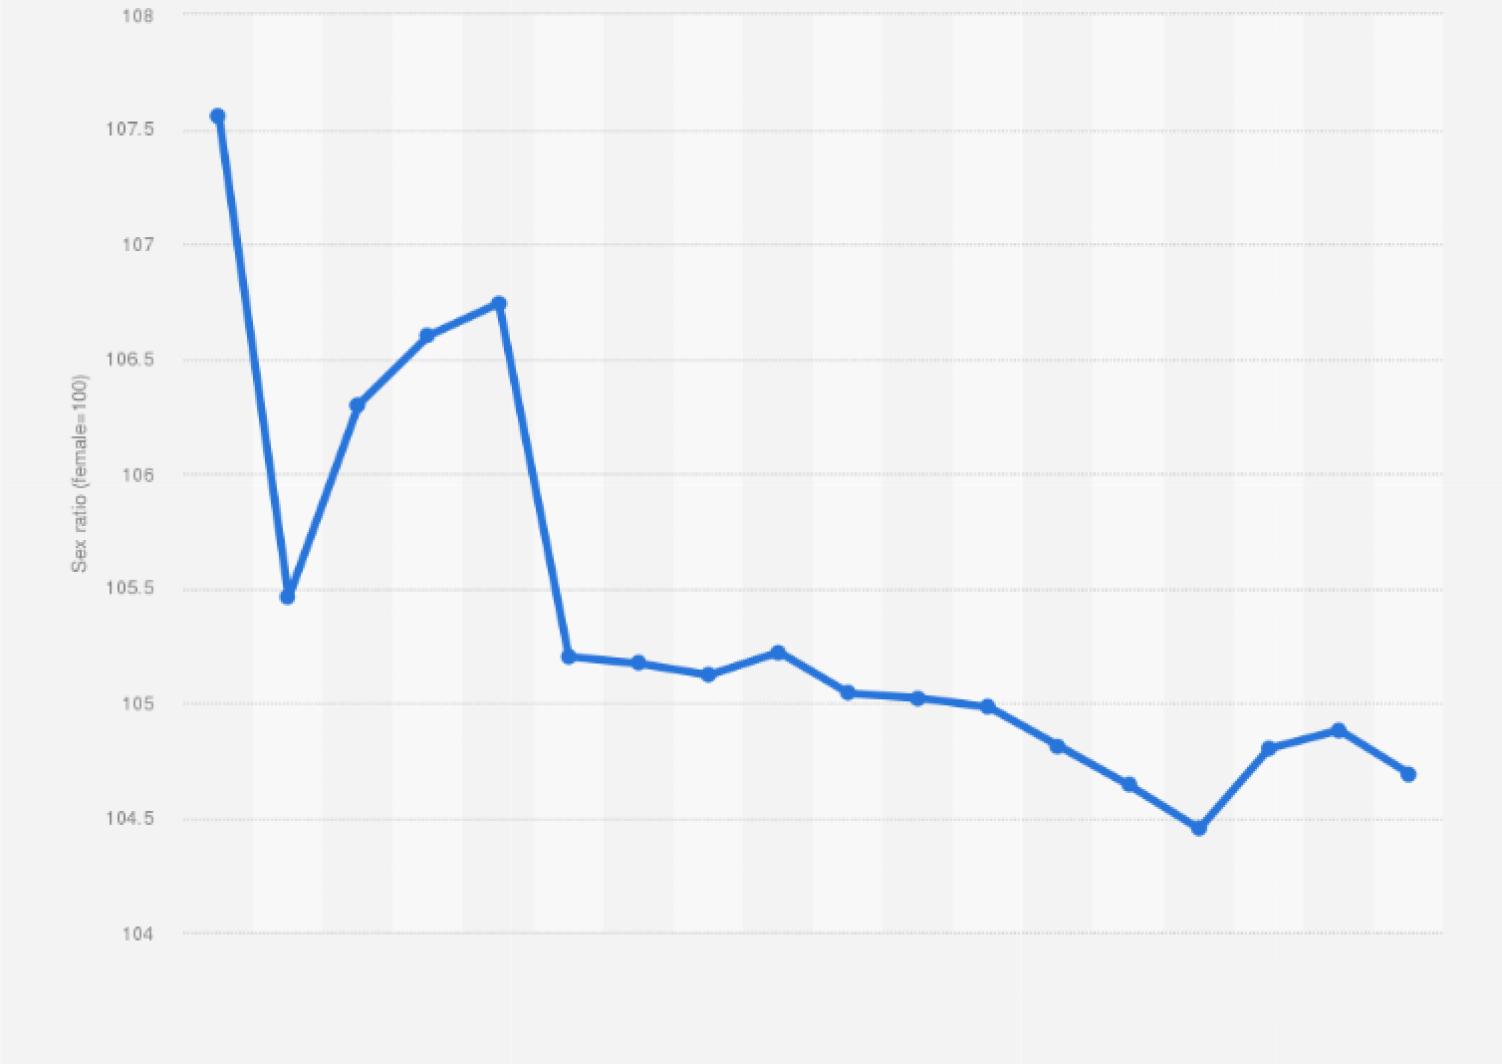 China Sex Ratio Statista